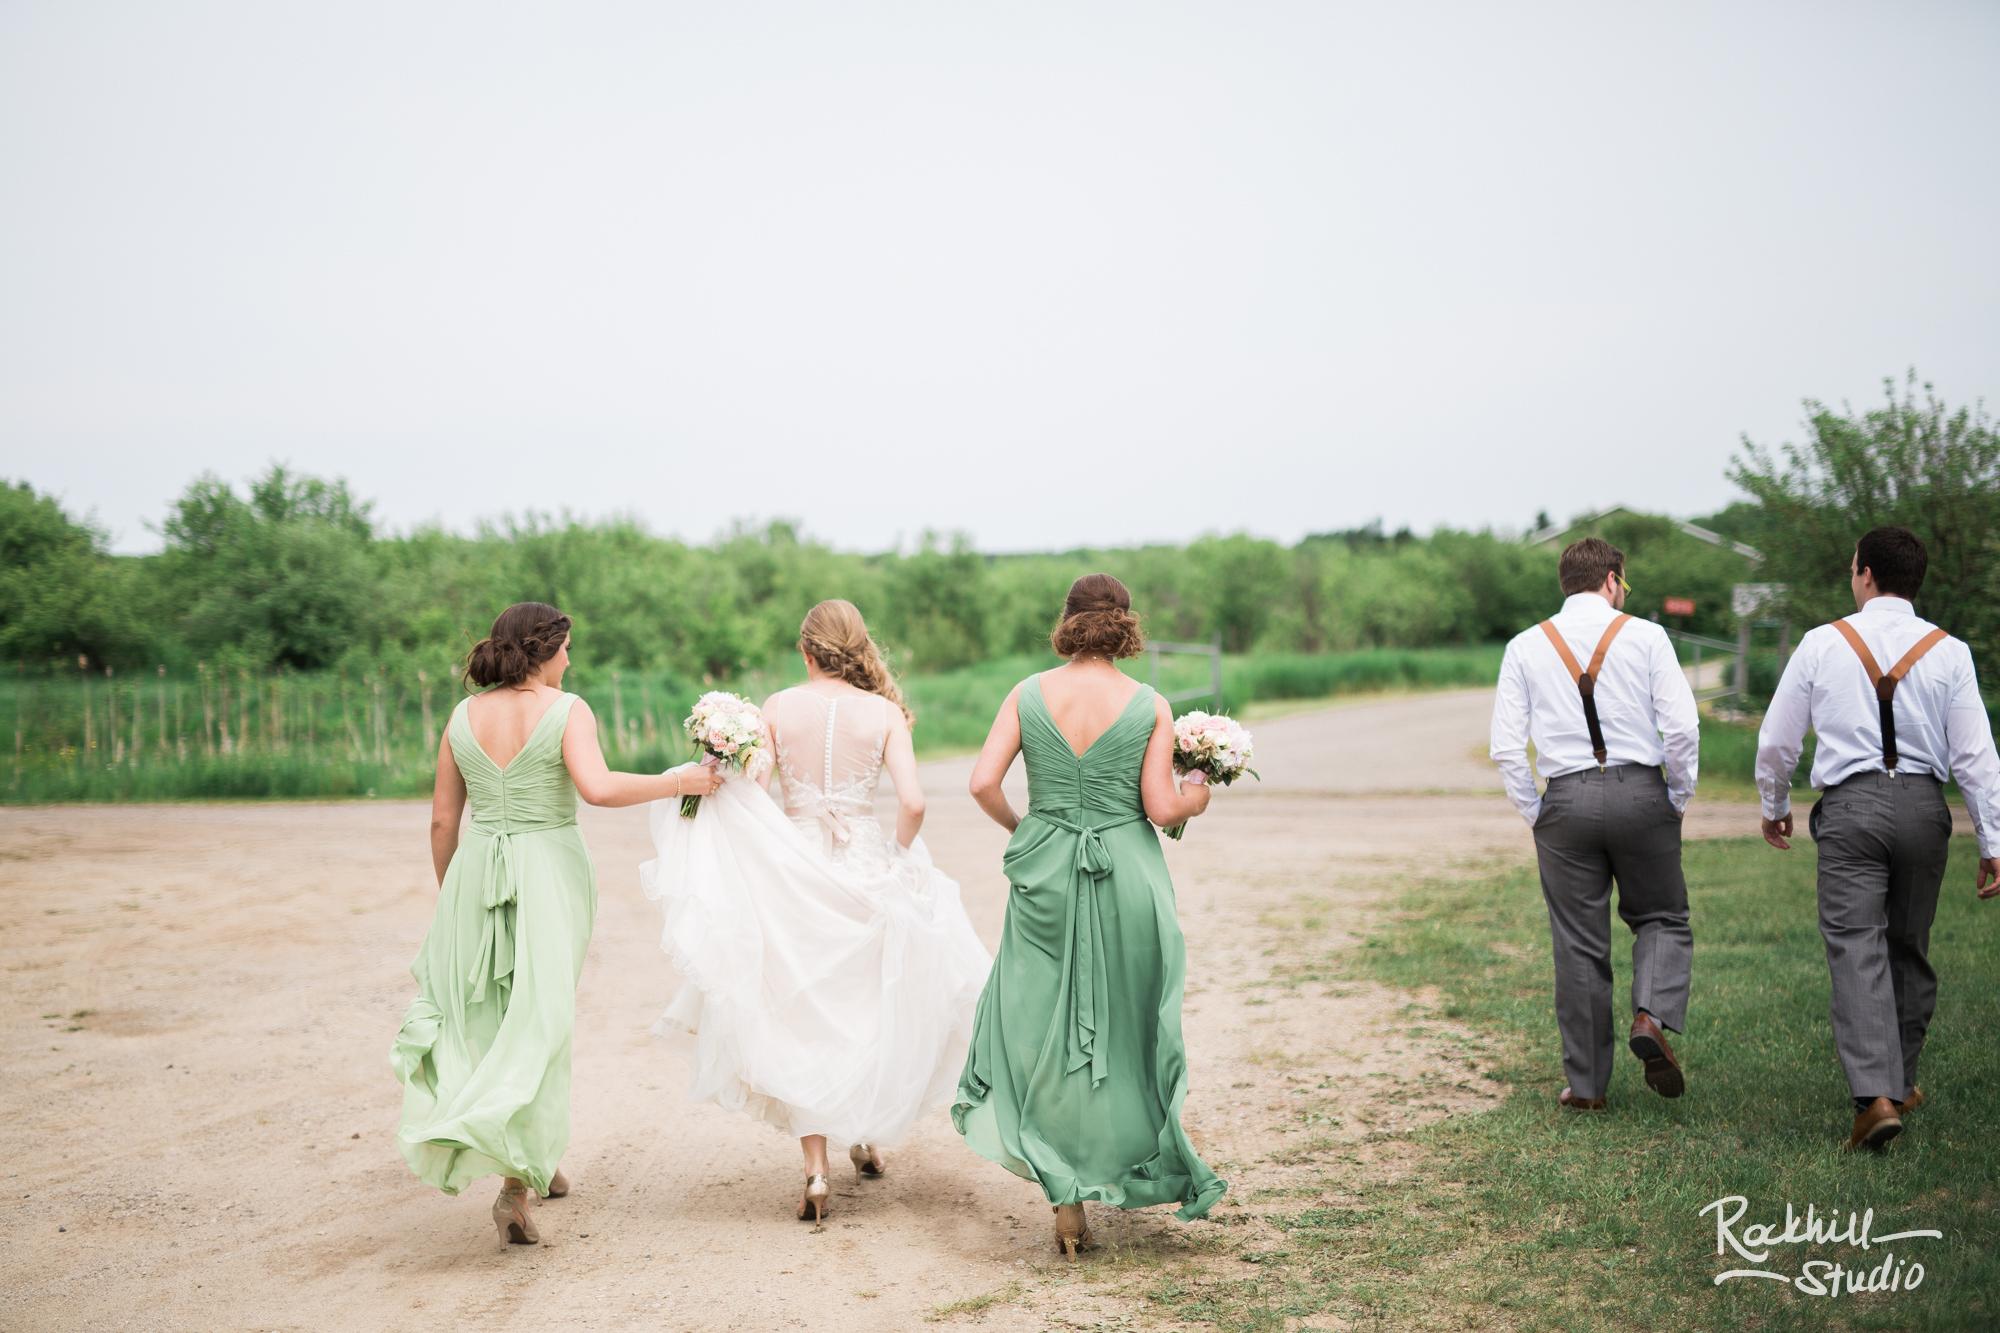 newberry-michigan-wedding-upper-peninsula-spring-photography-rockhill-ee-26.jpg